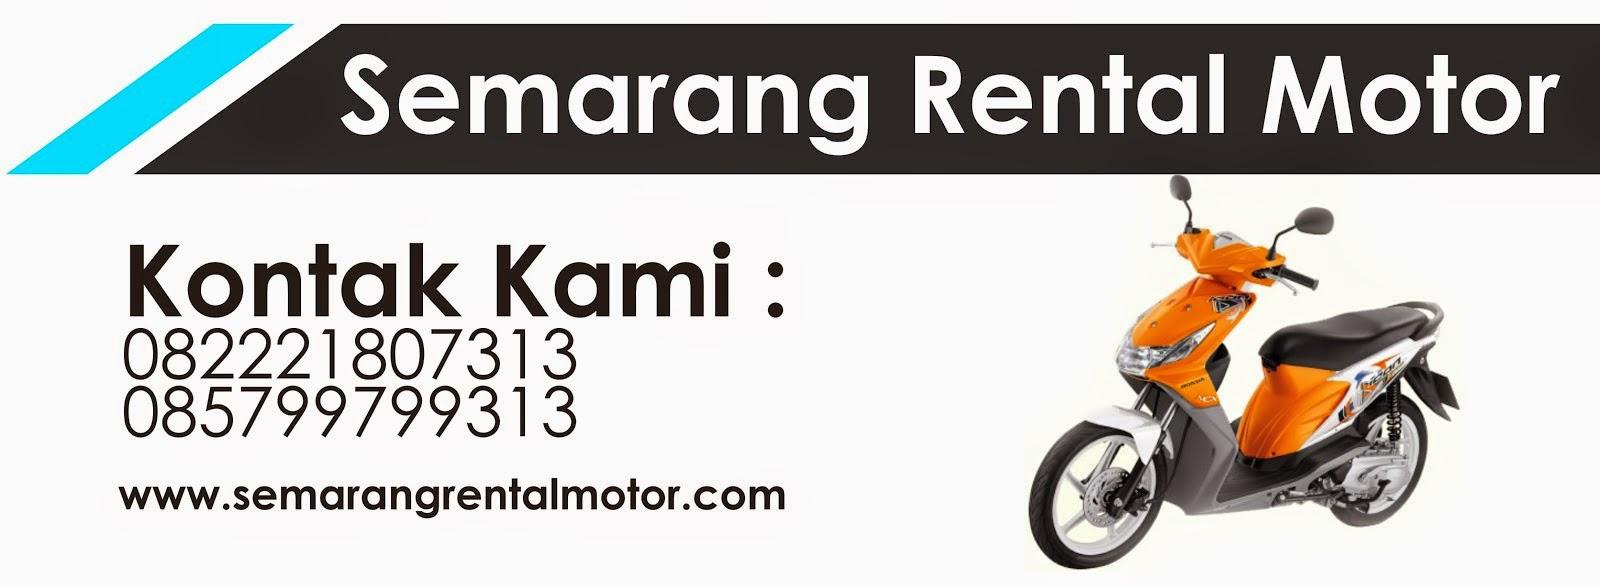 Semarang Rental Motor